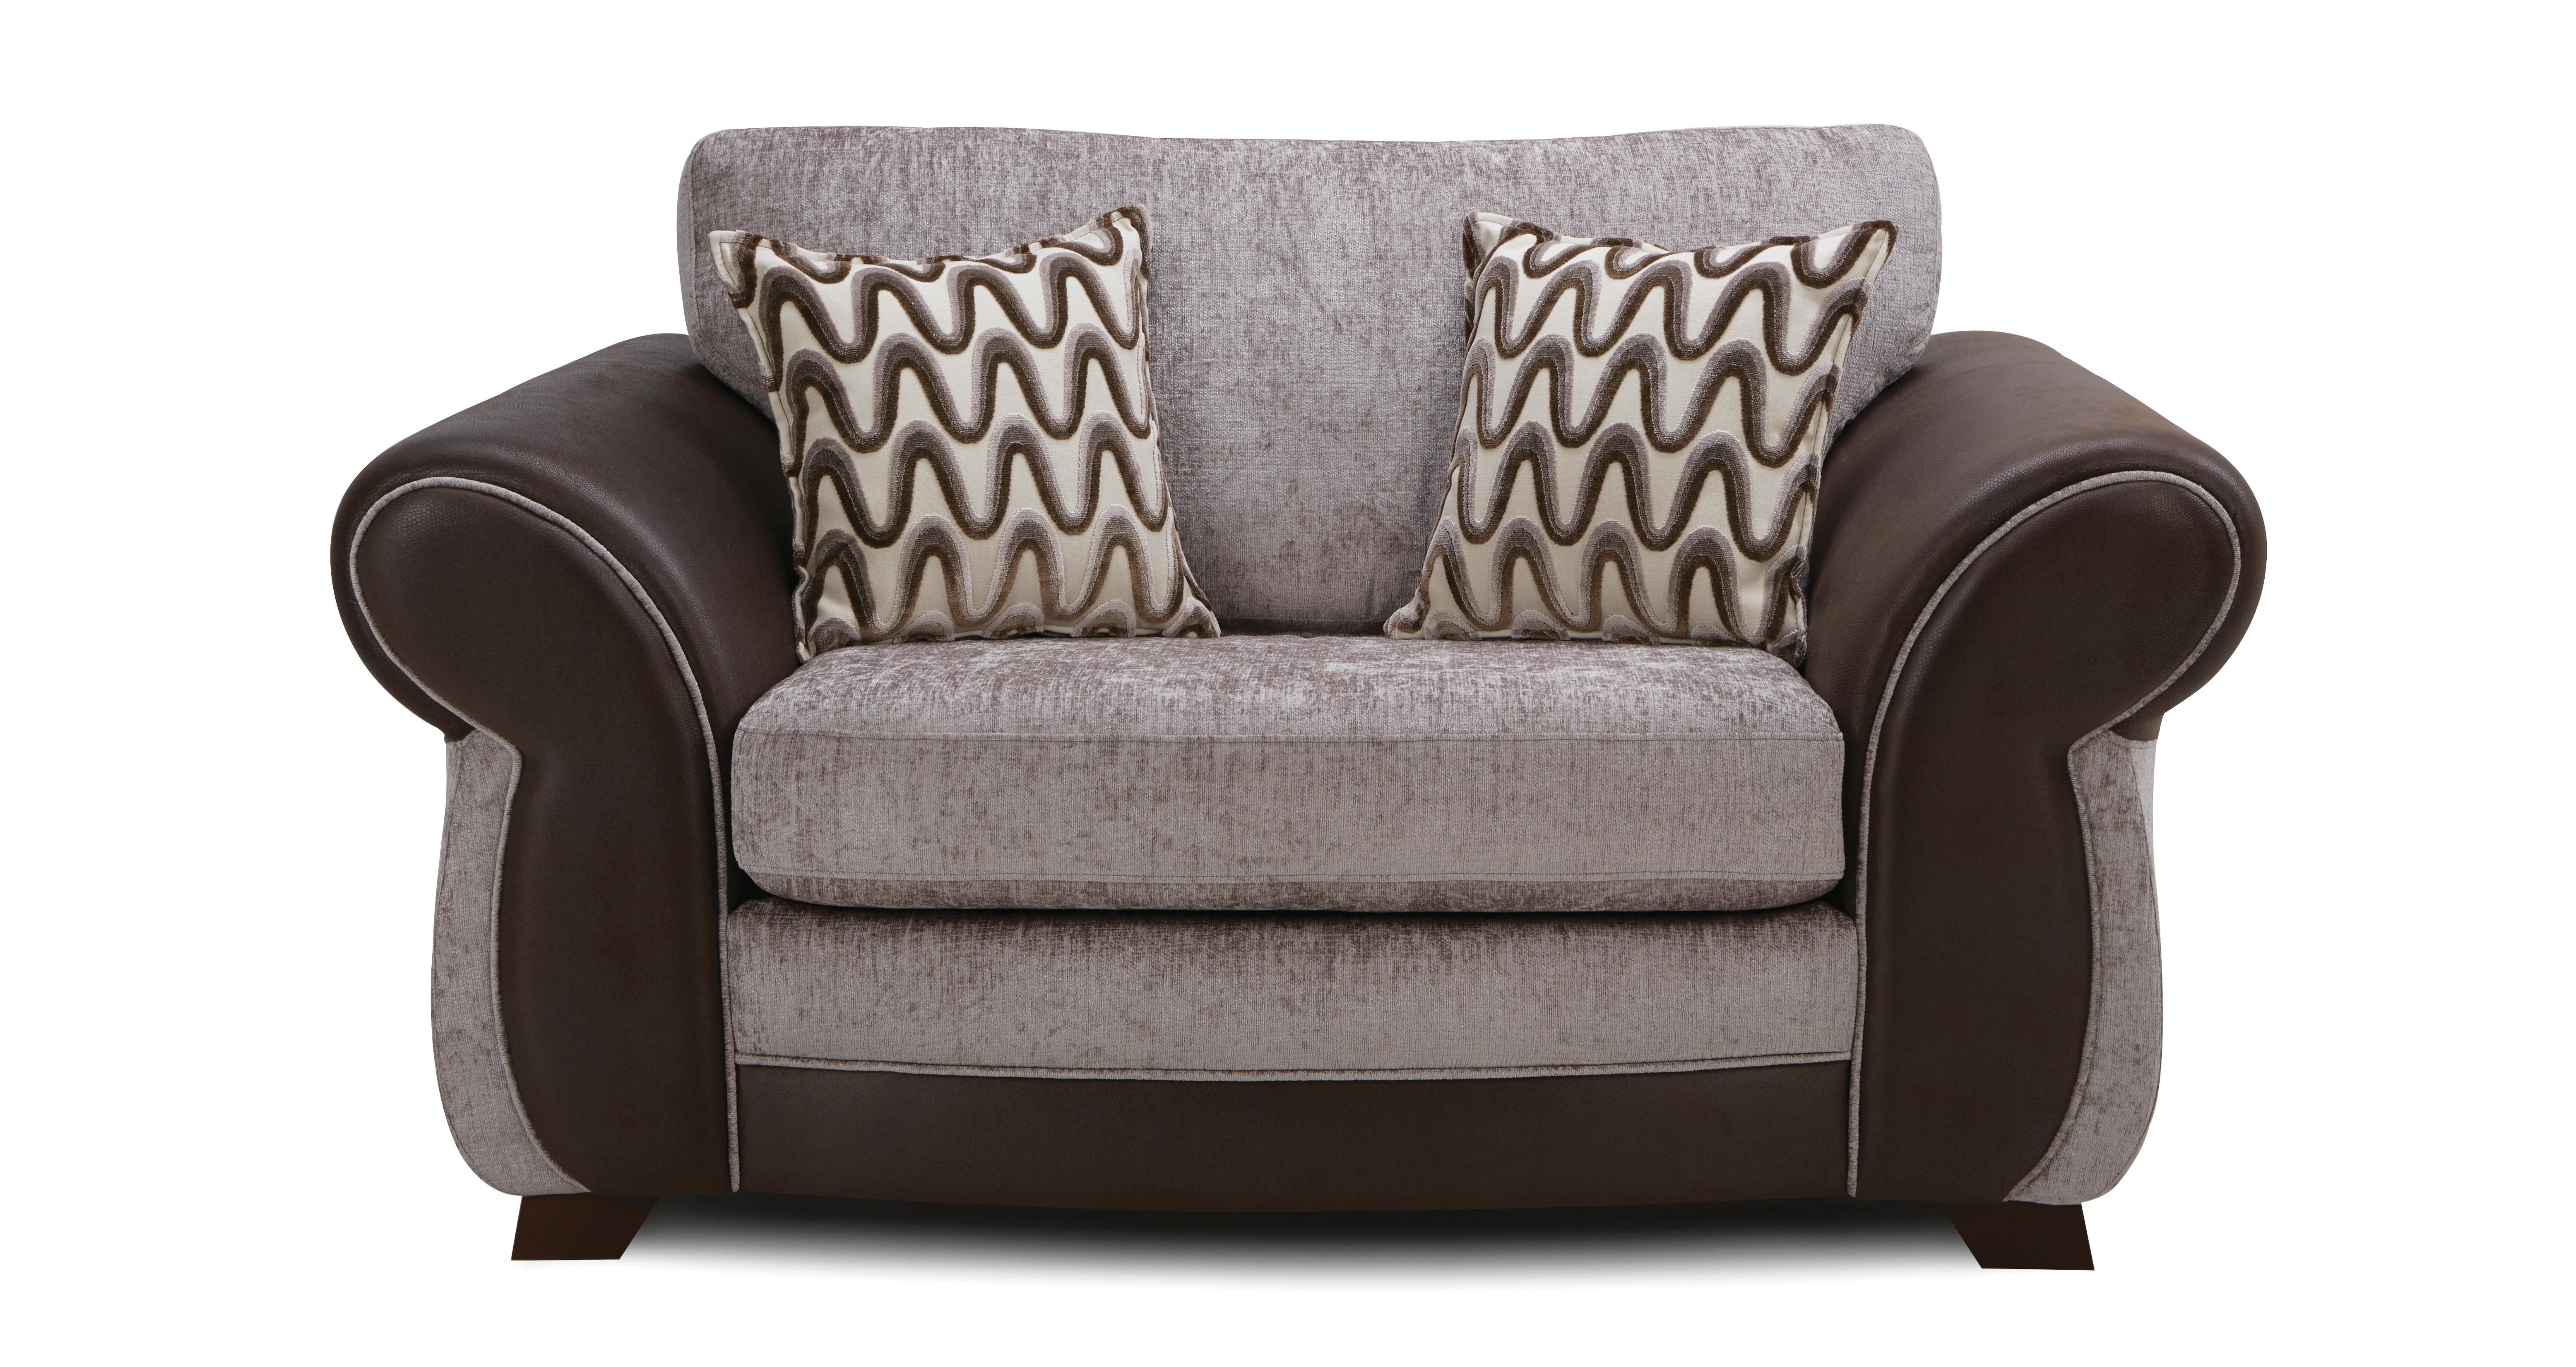 Magnificent Himara Pillow Back Small 2 Seater Sofa Uwap Interior Chair Design Uwaporg